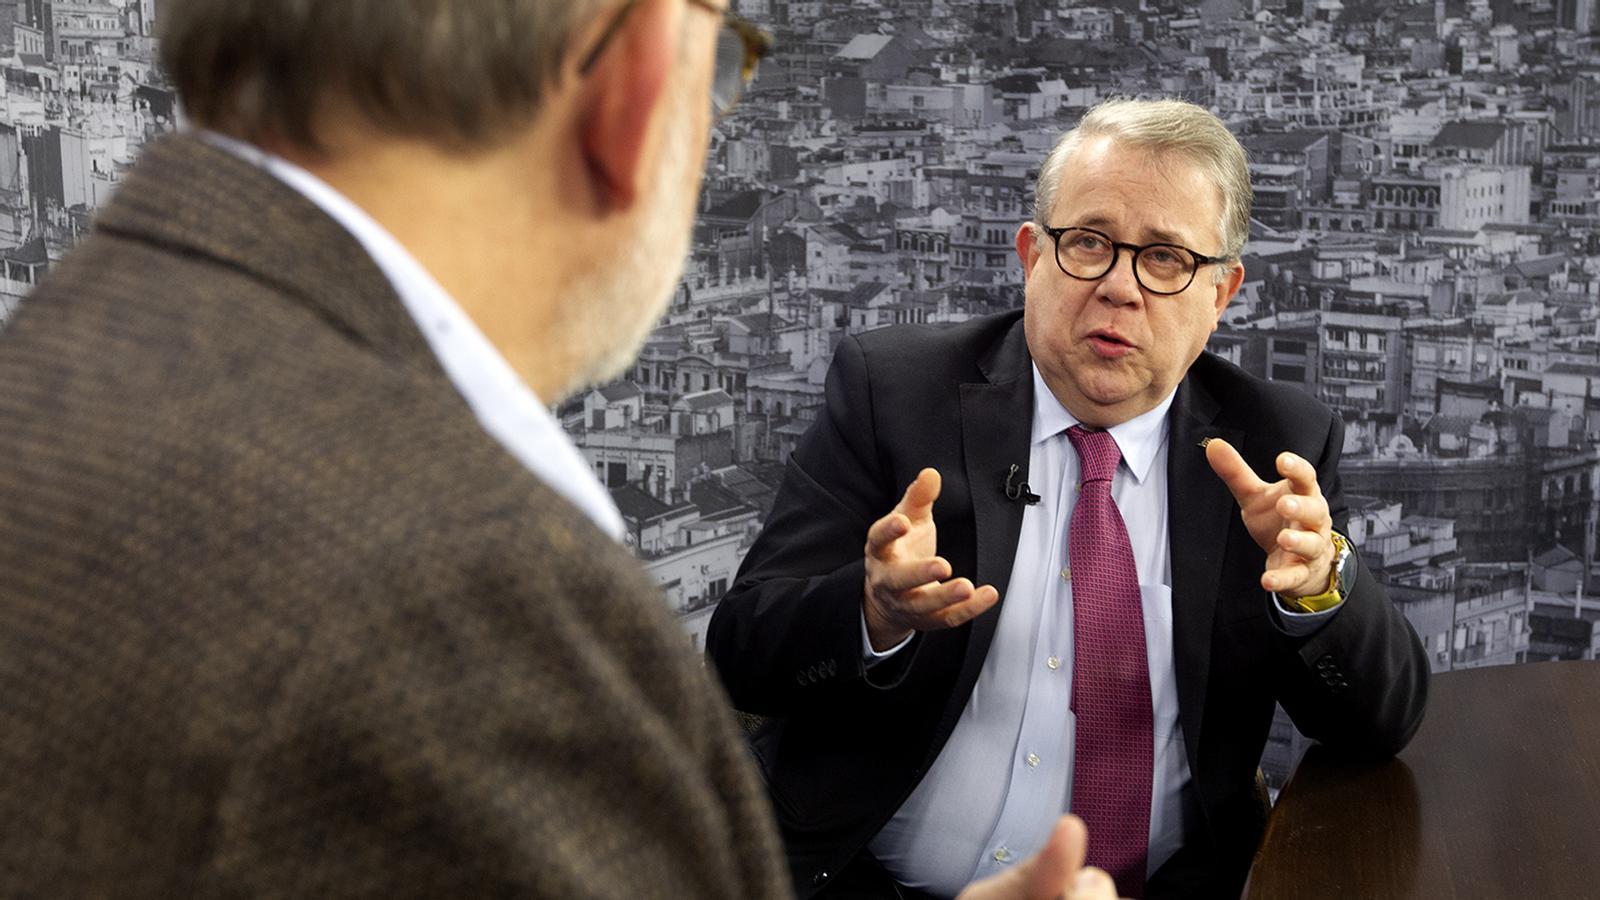 Entrevista d'Antoni Bassas al Dr. Jaume Padrós